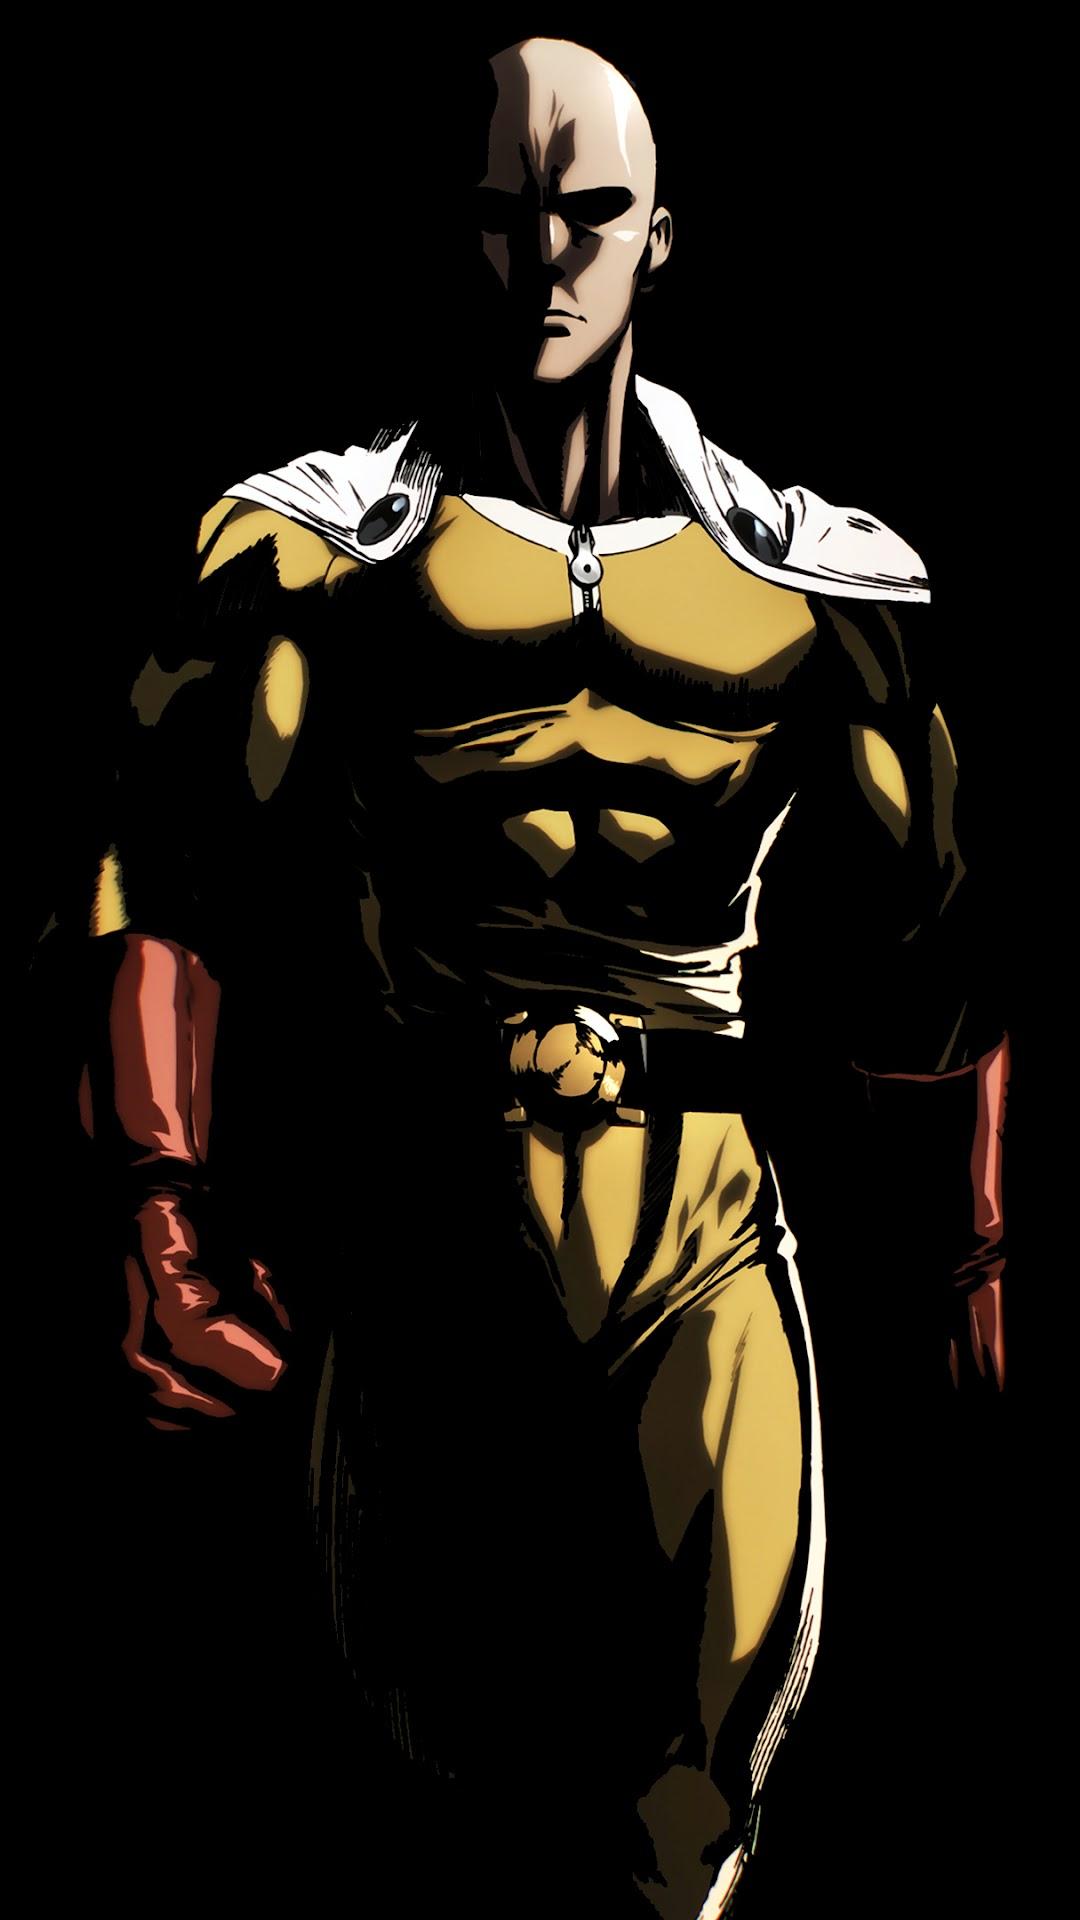 Saitama One Punch Man 4k Wallpaper 100